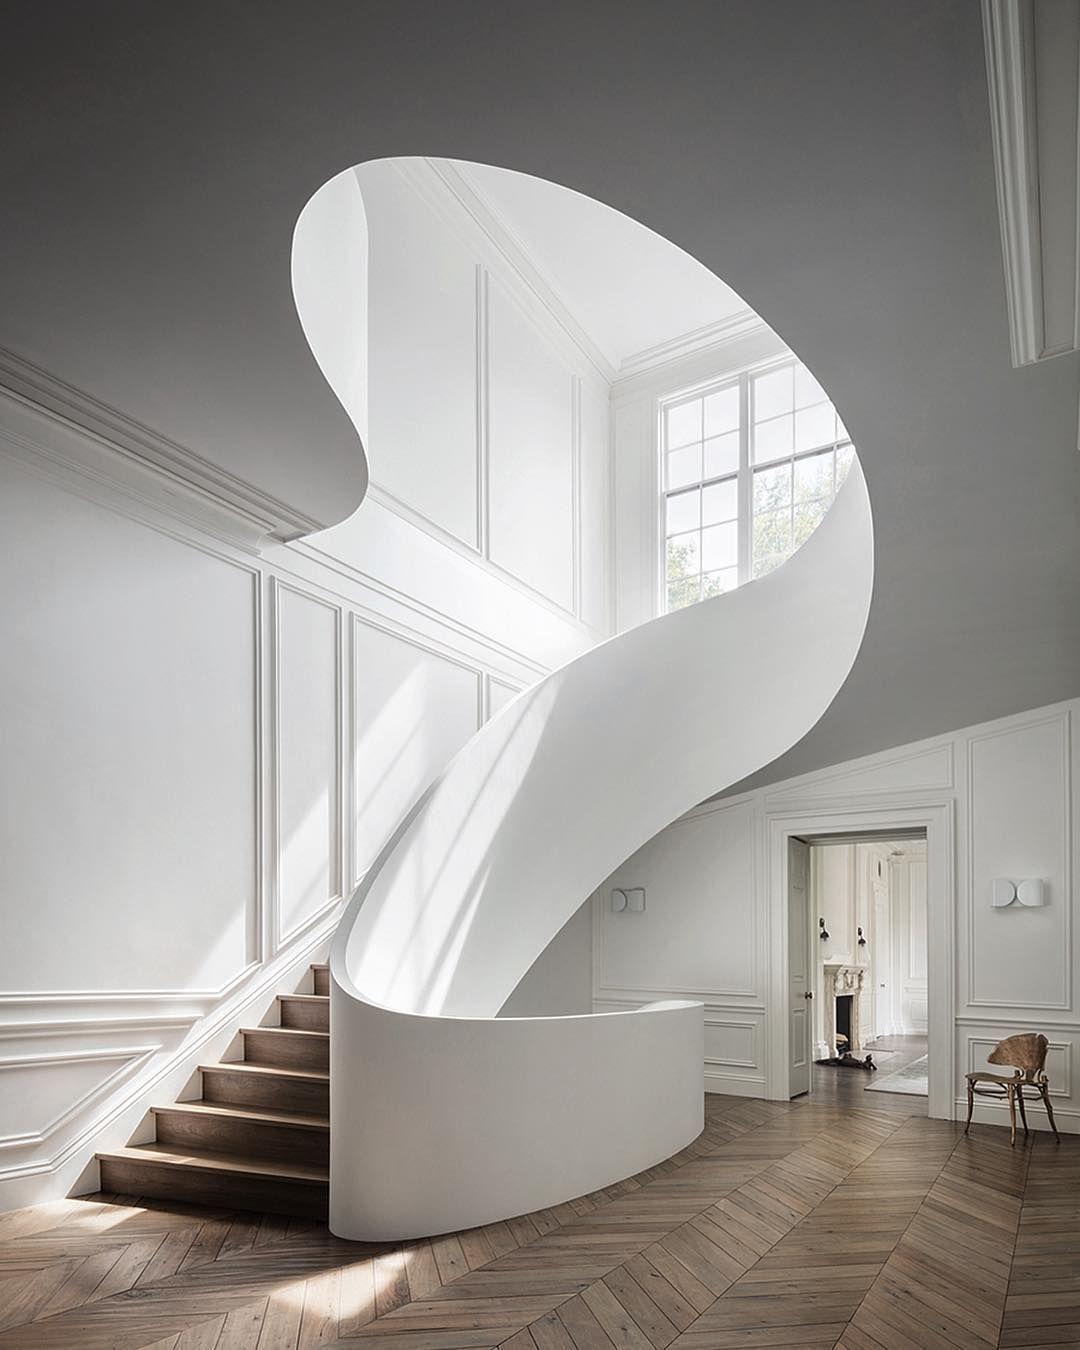 Vanna Albertini Abitare On Instagram Mesmerizing By Stevenharrisarchitects Find Inspir In 2020 Minimalist House Design Minimalist Interior Design Stairs Design